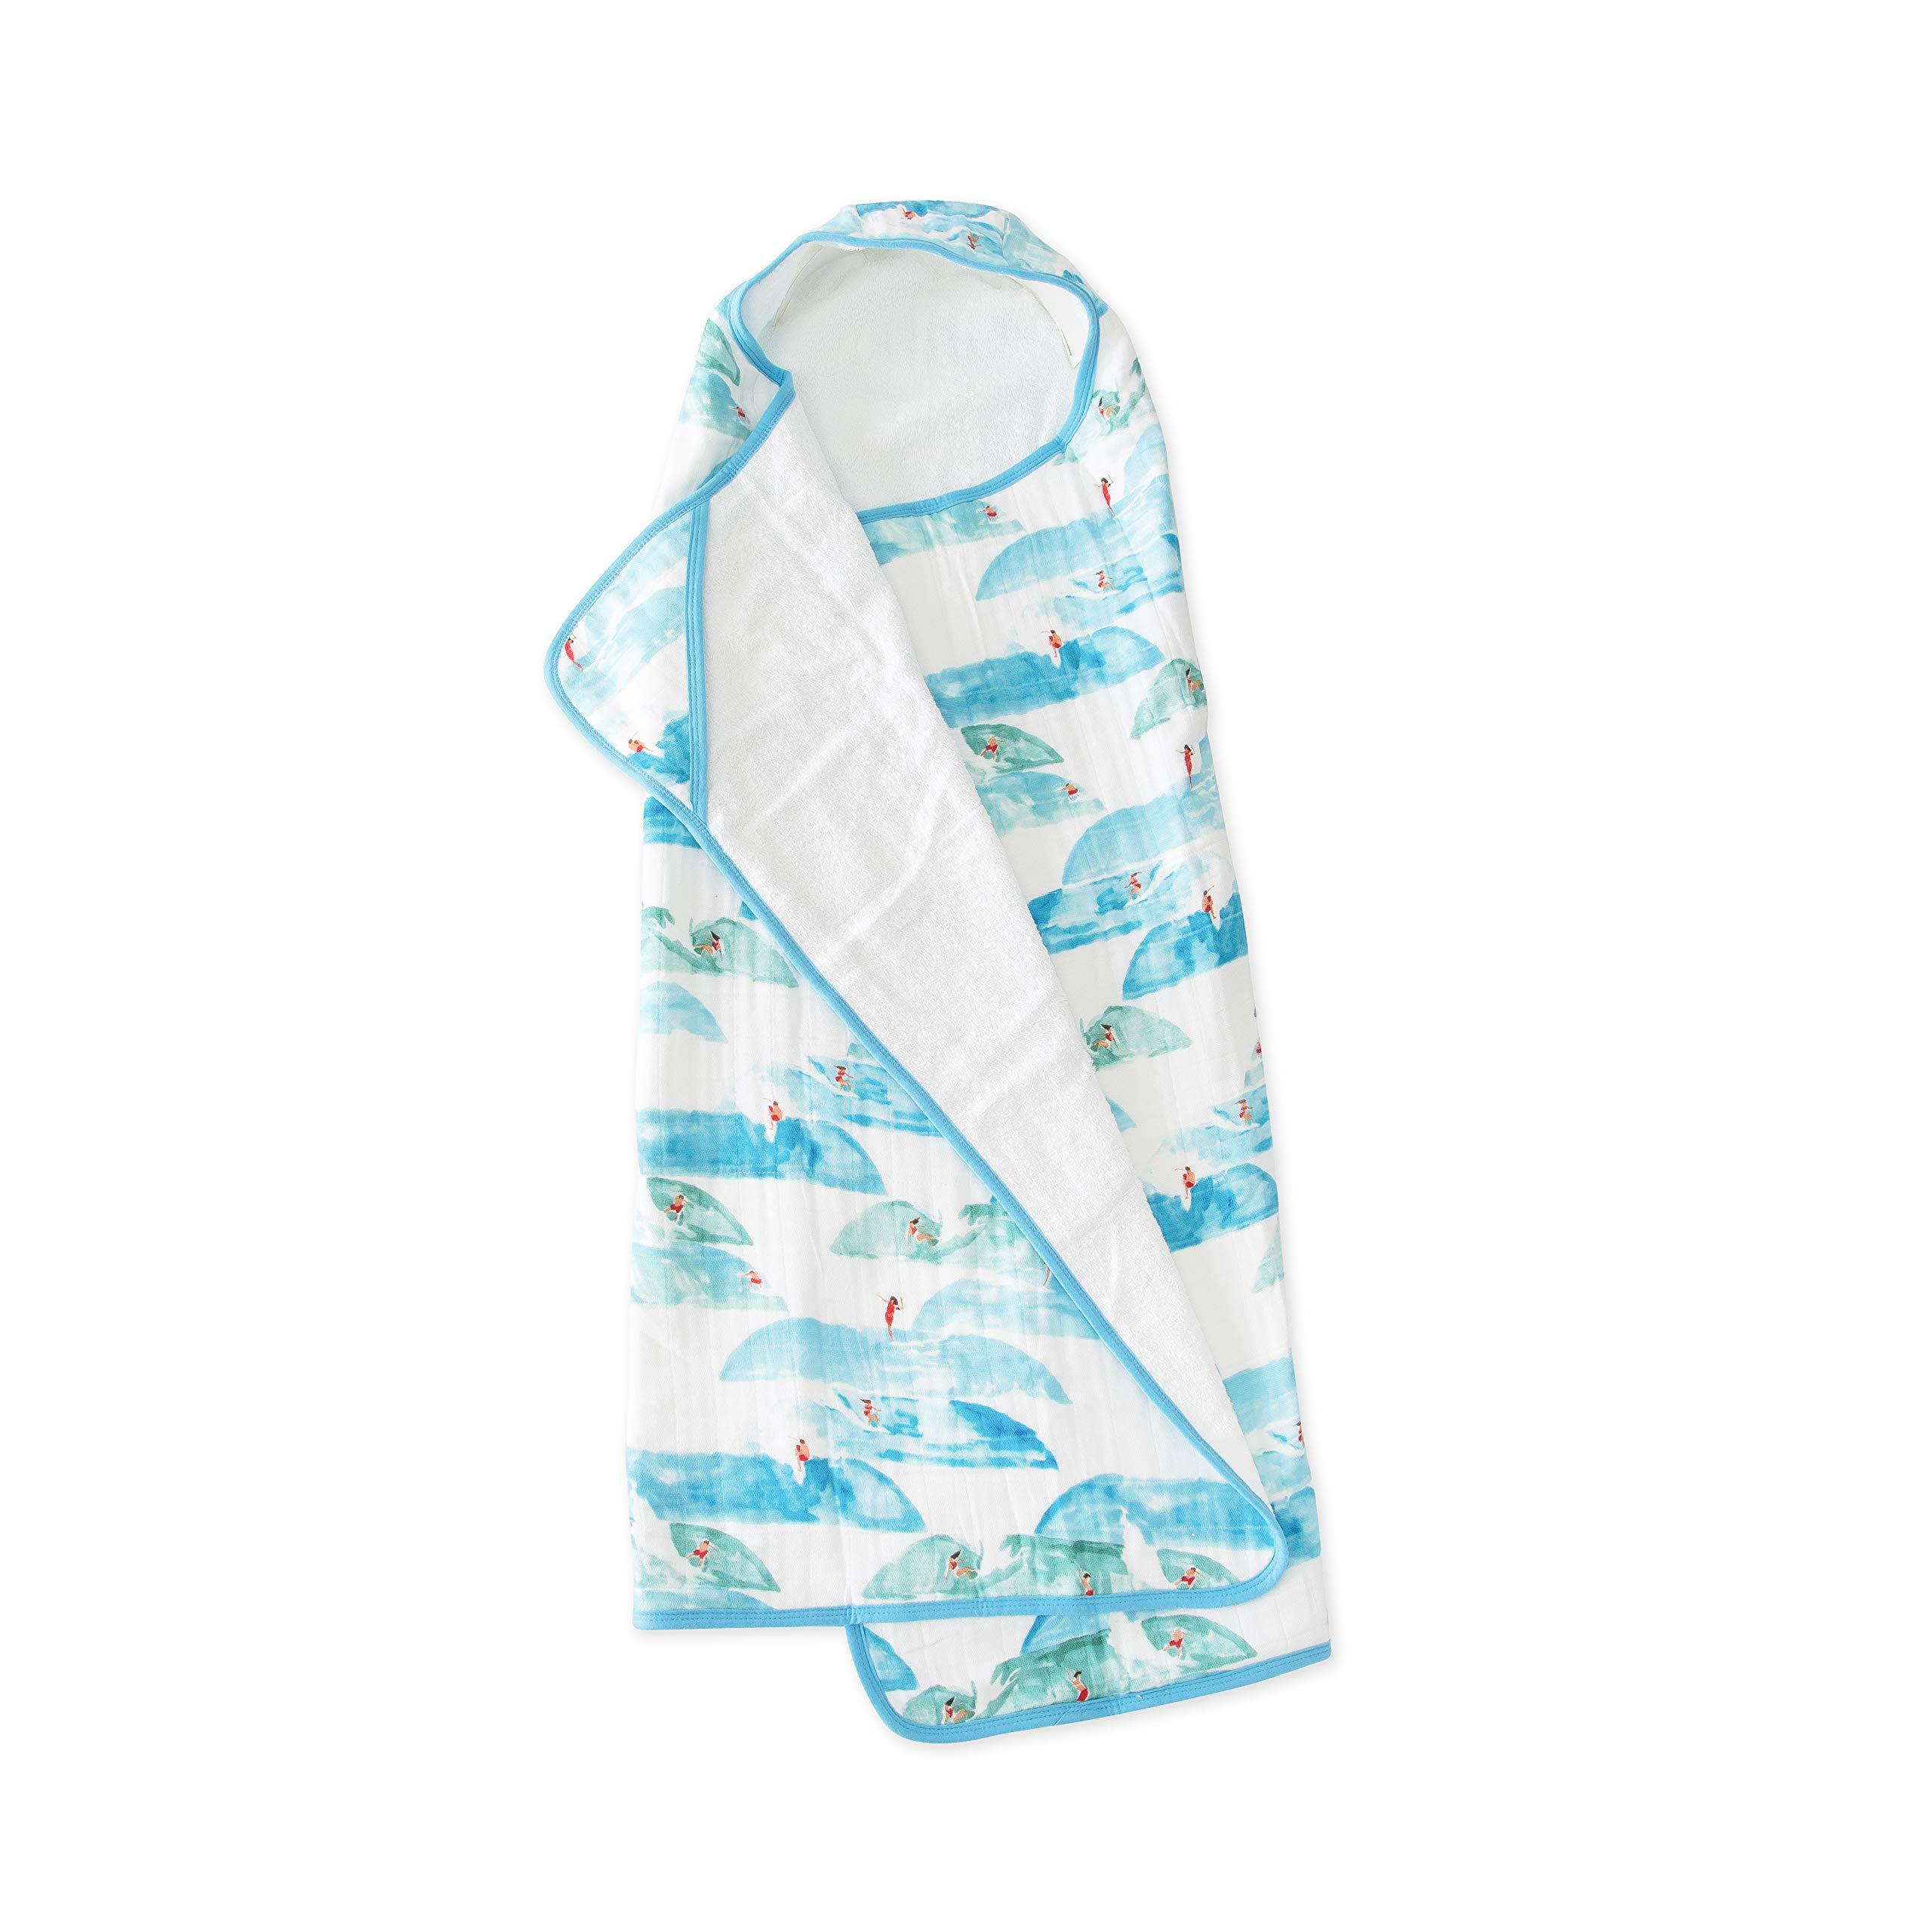 Little Unicorn Large Cotton Hooded Towel - Surf